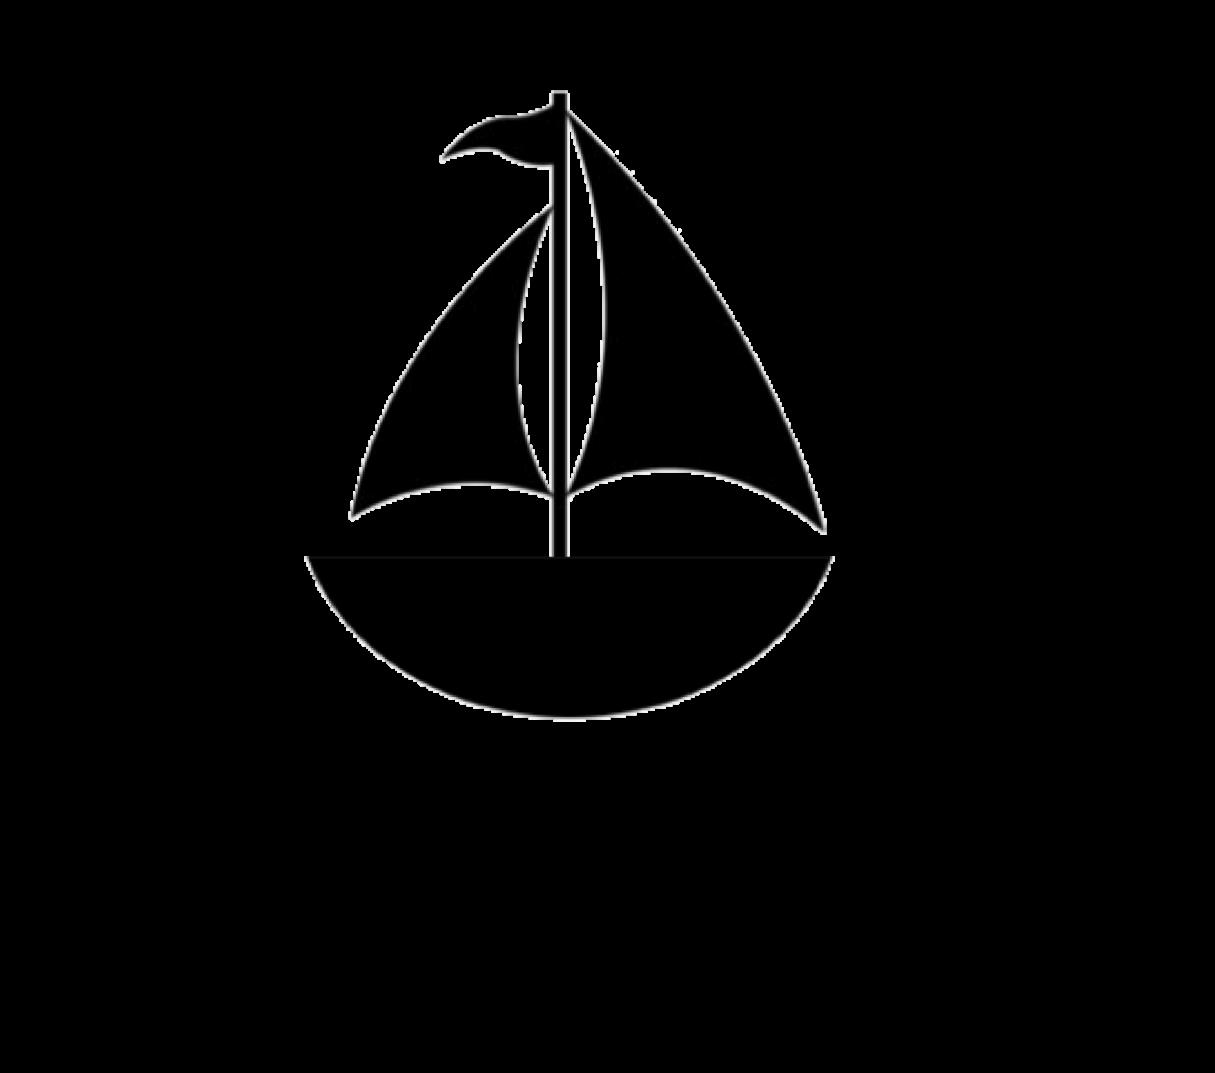 Sailboat Tattoo Let Your Dreams Set Sail